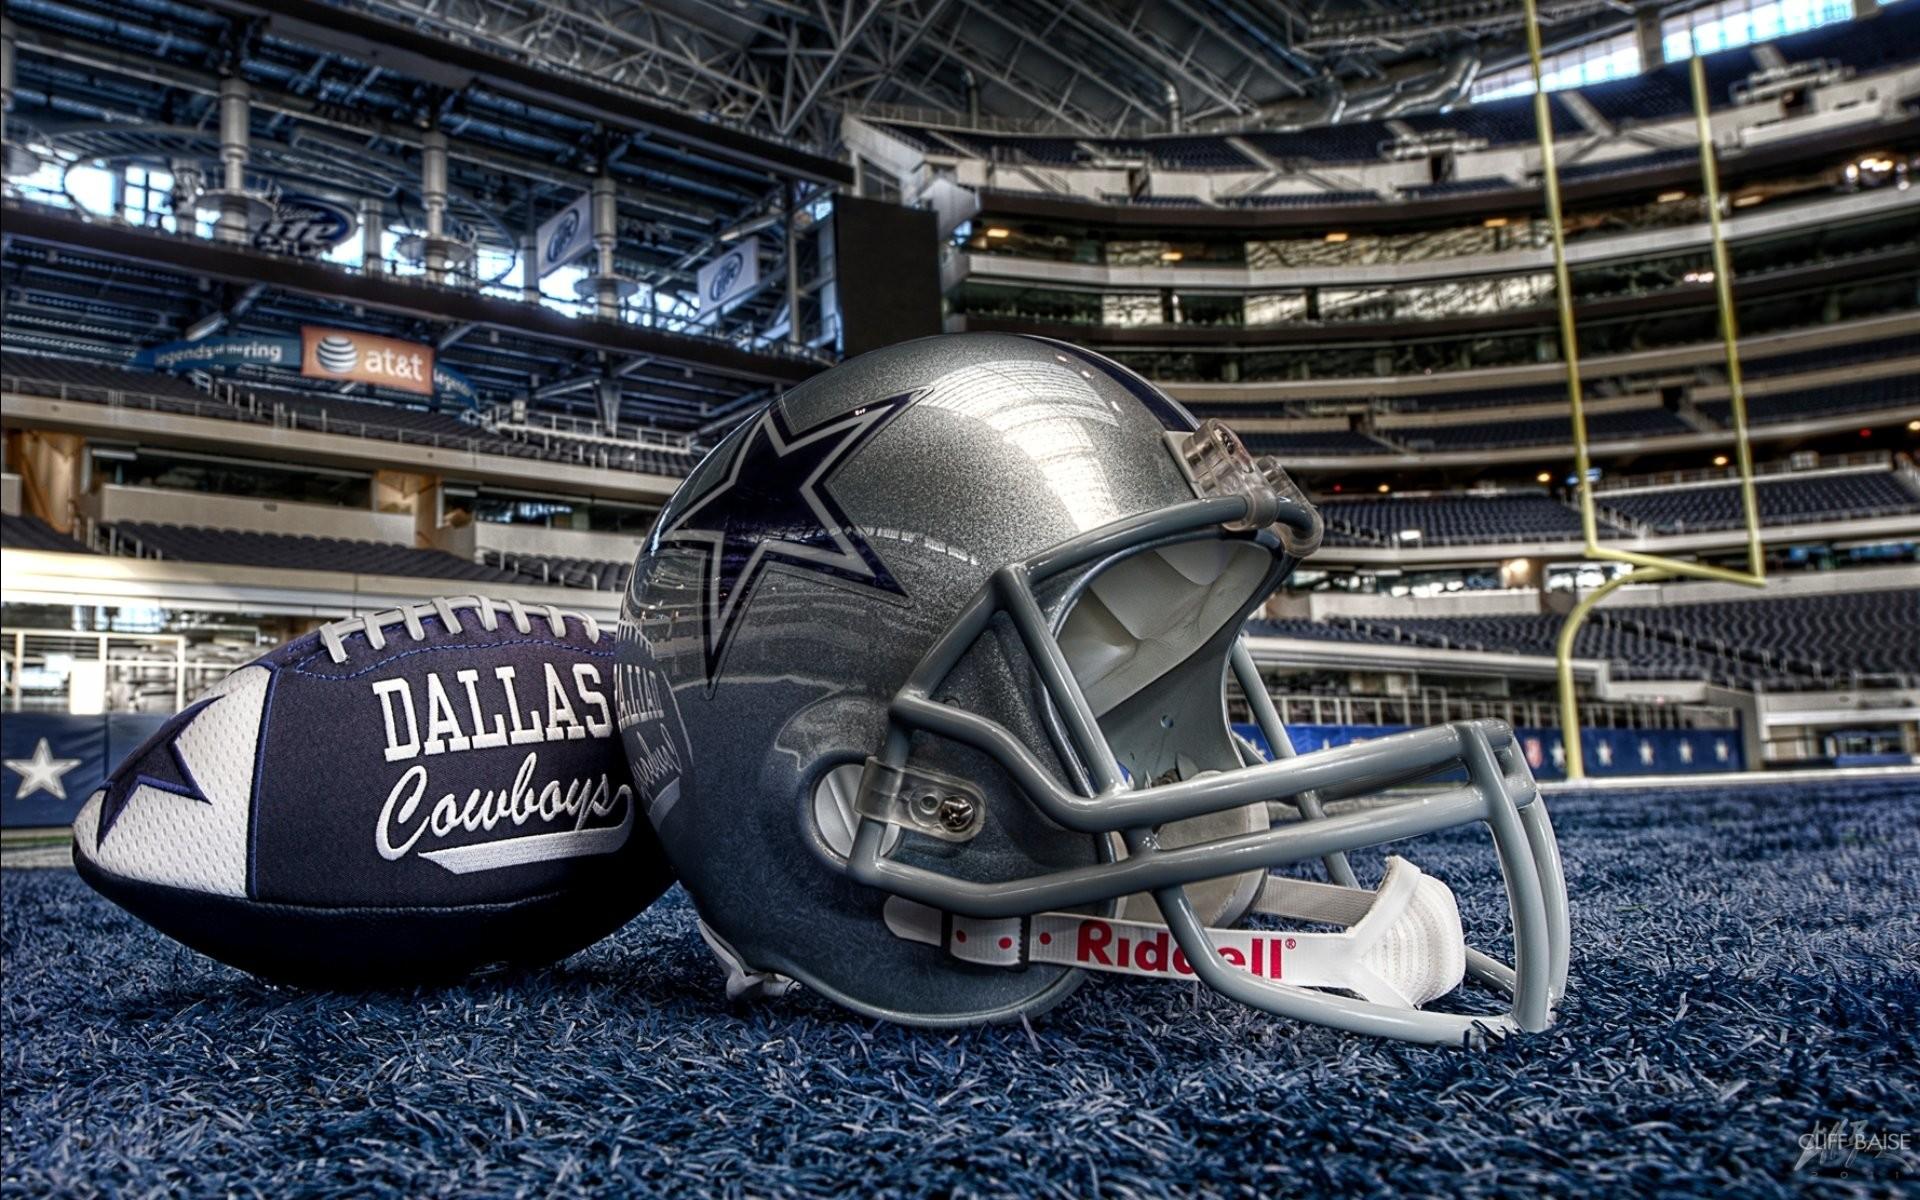 Dallas Cowboys Images Wallpapers Wallpapertag